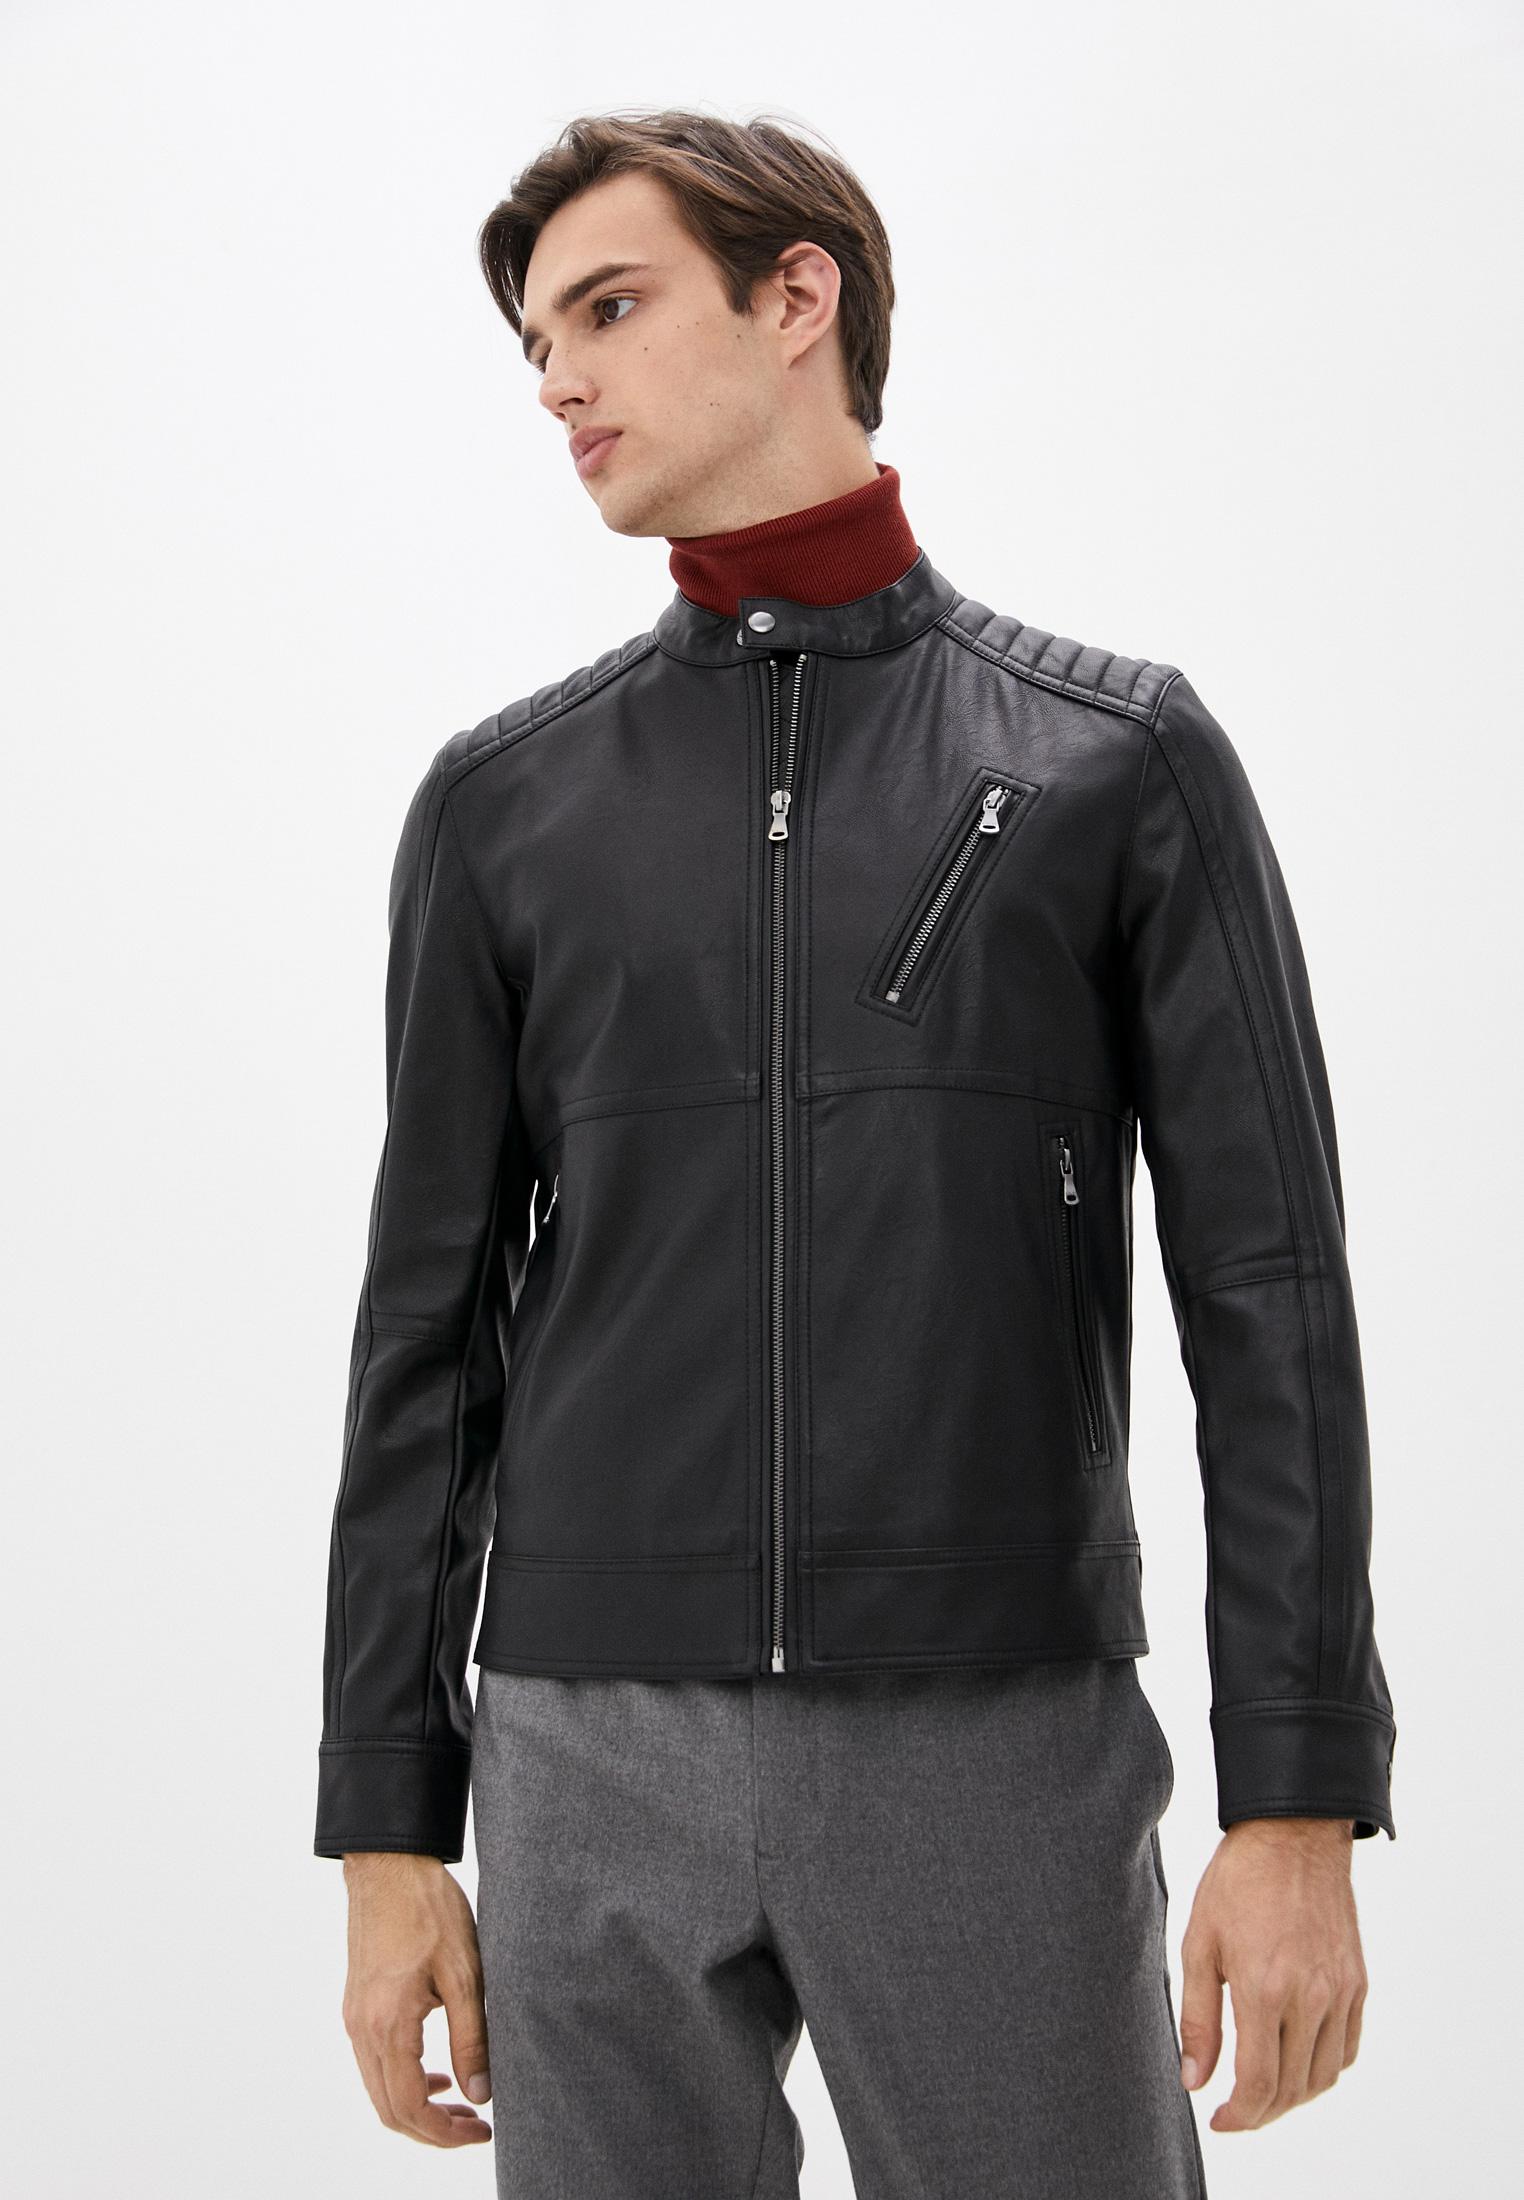 Кожаная куртка Sisley (Сислей) Куртка кожаная Sisley